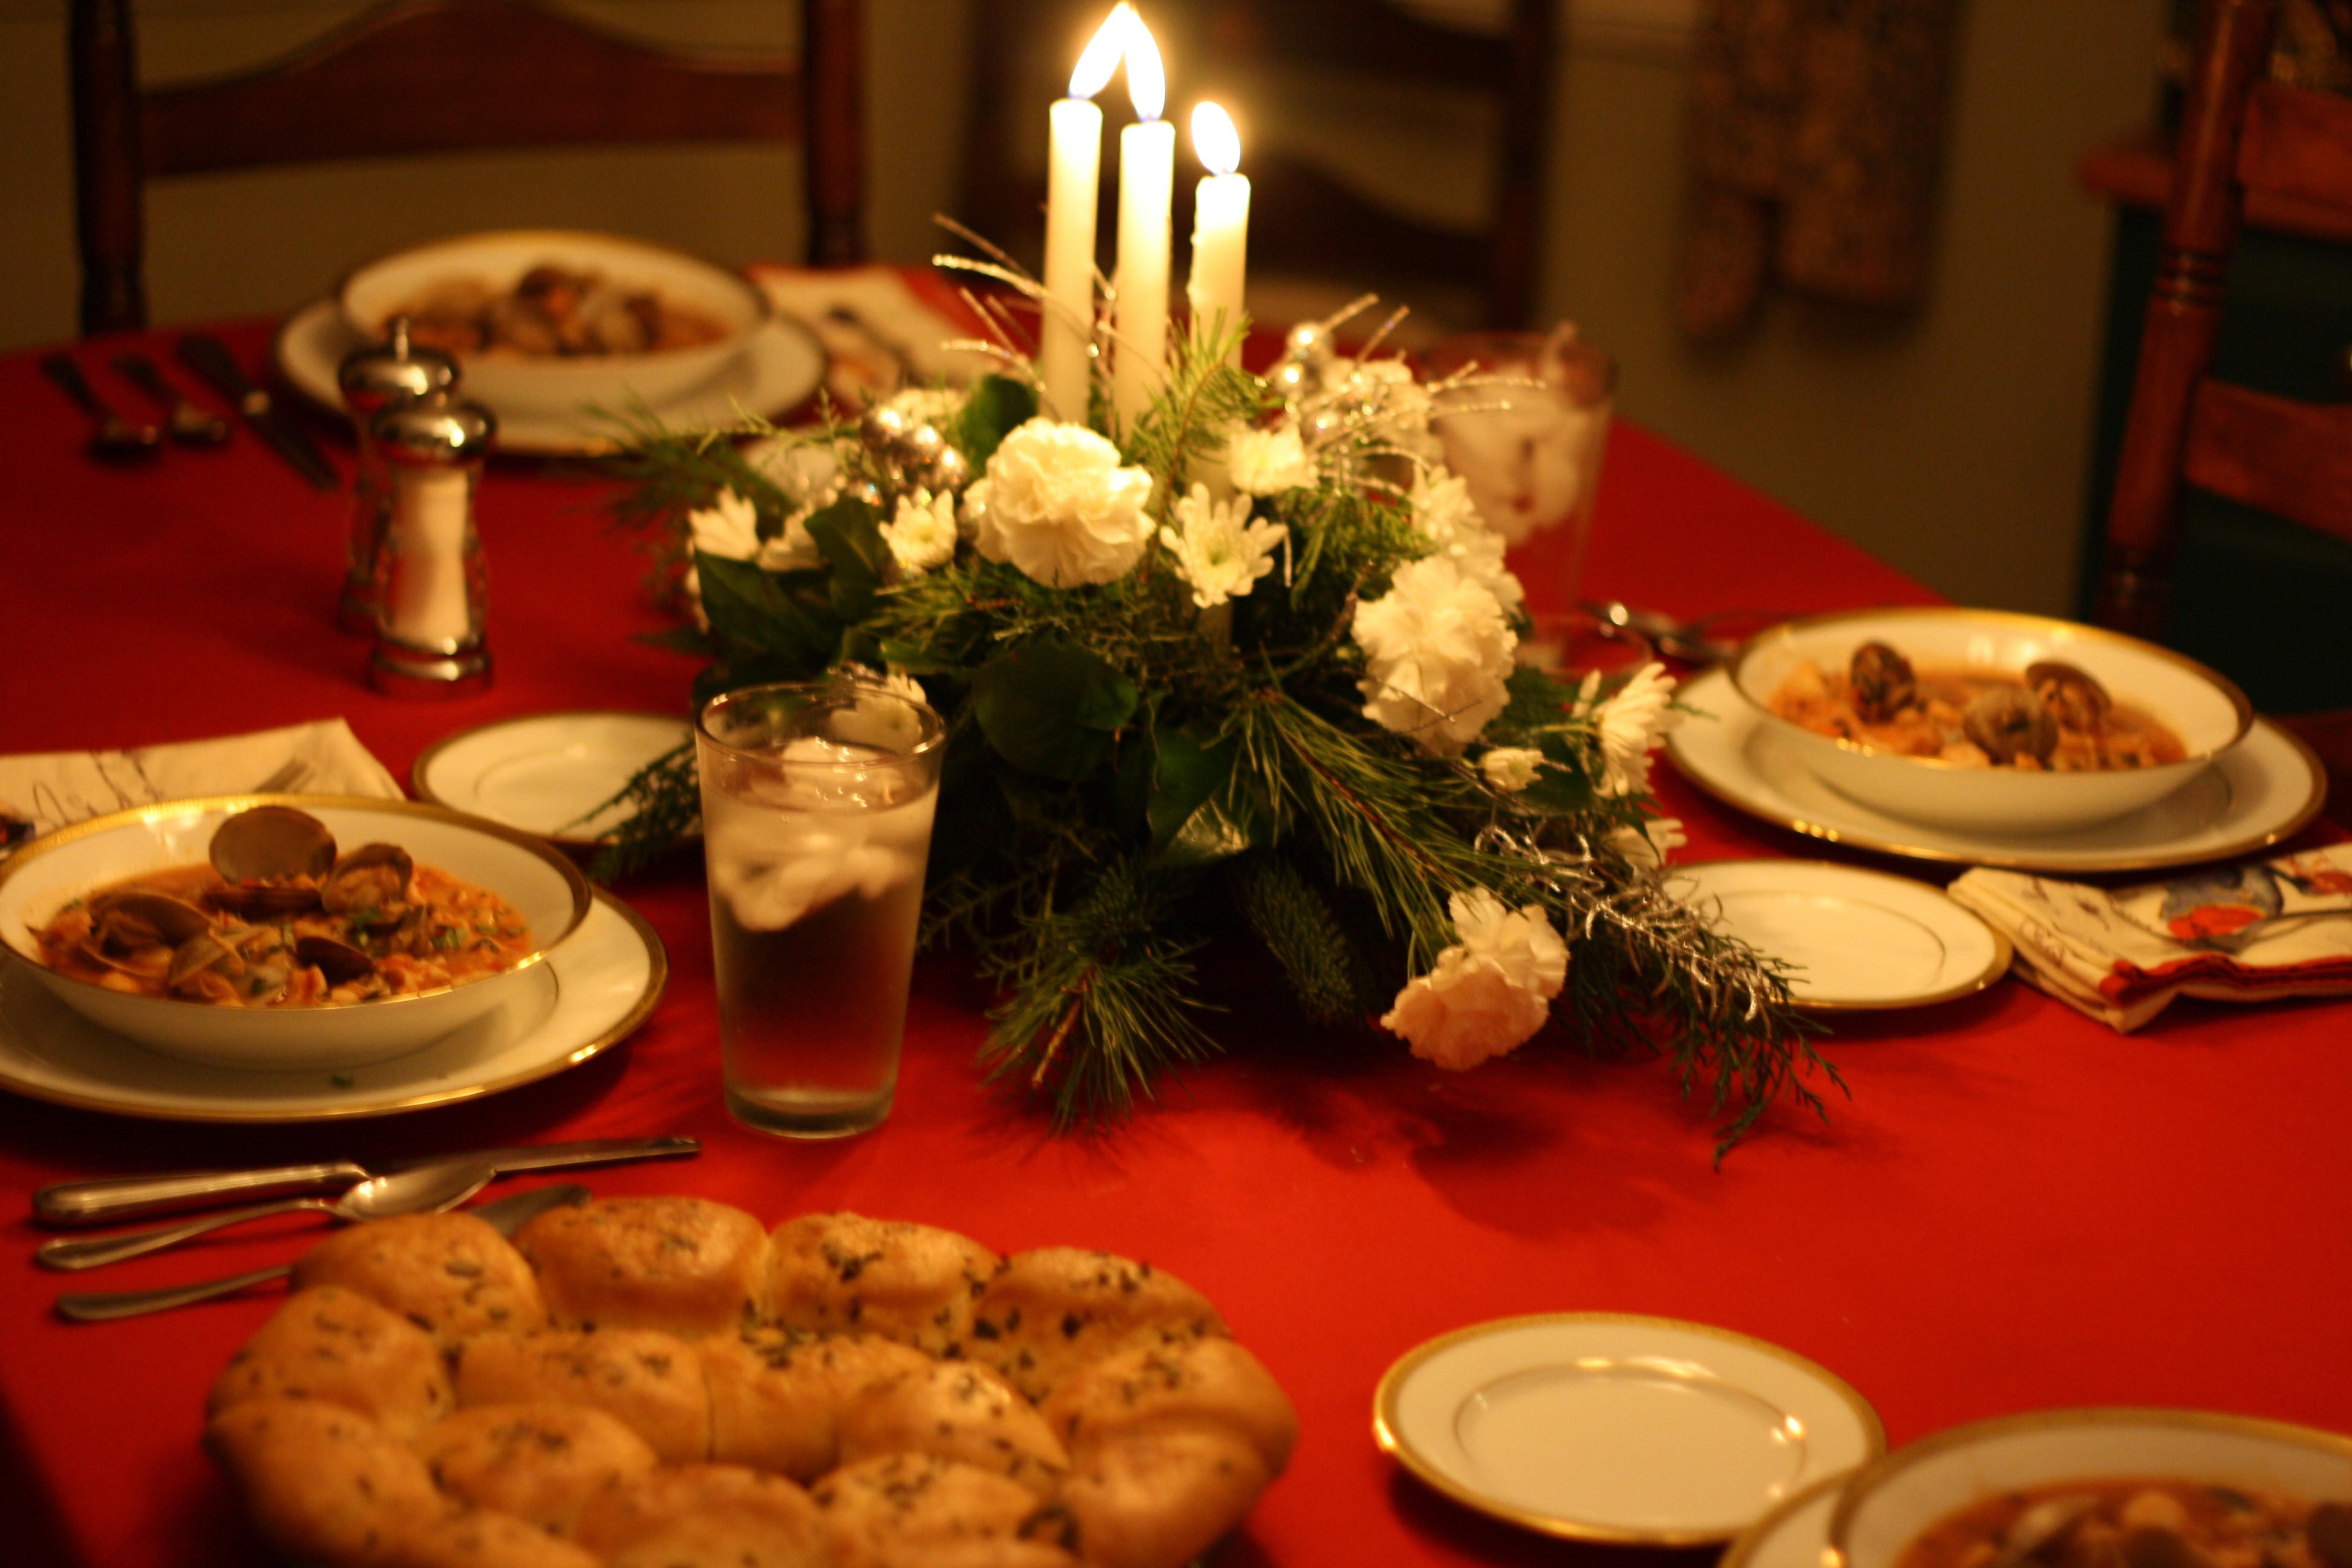 Christmas Eve Dinners  Christmas Eve 2009 – Bouillabaisse